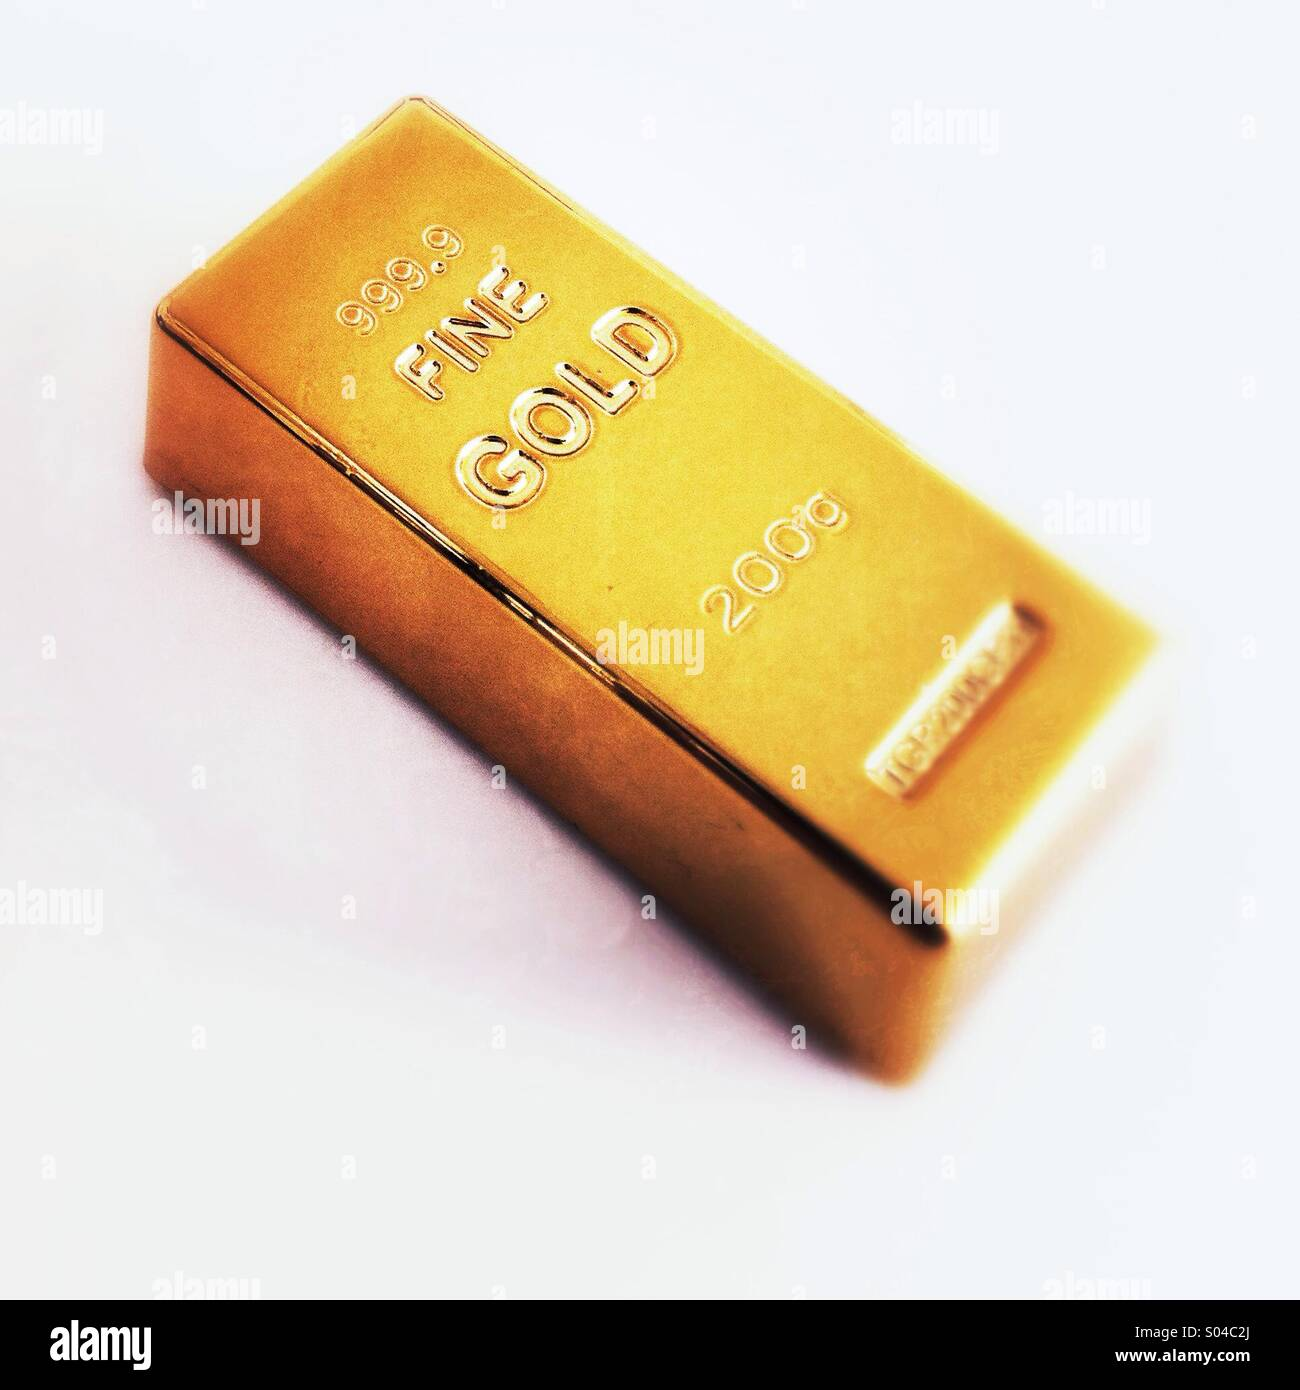 Gold bar 200 grams - Stock Image